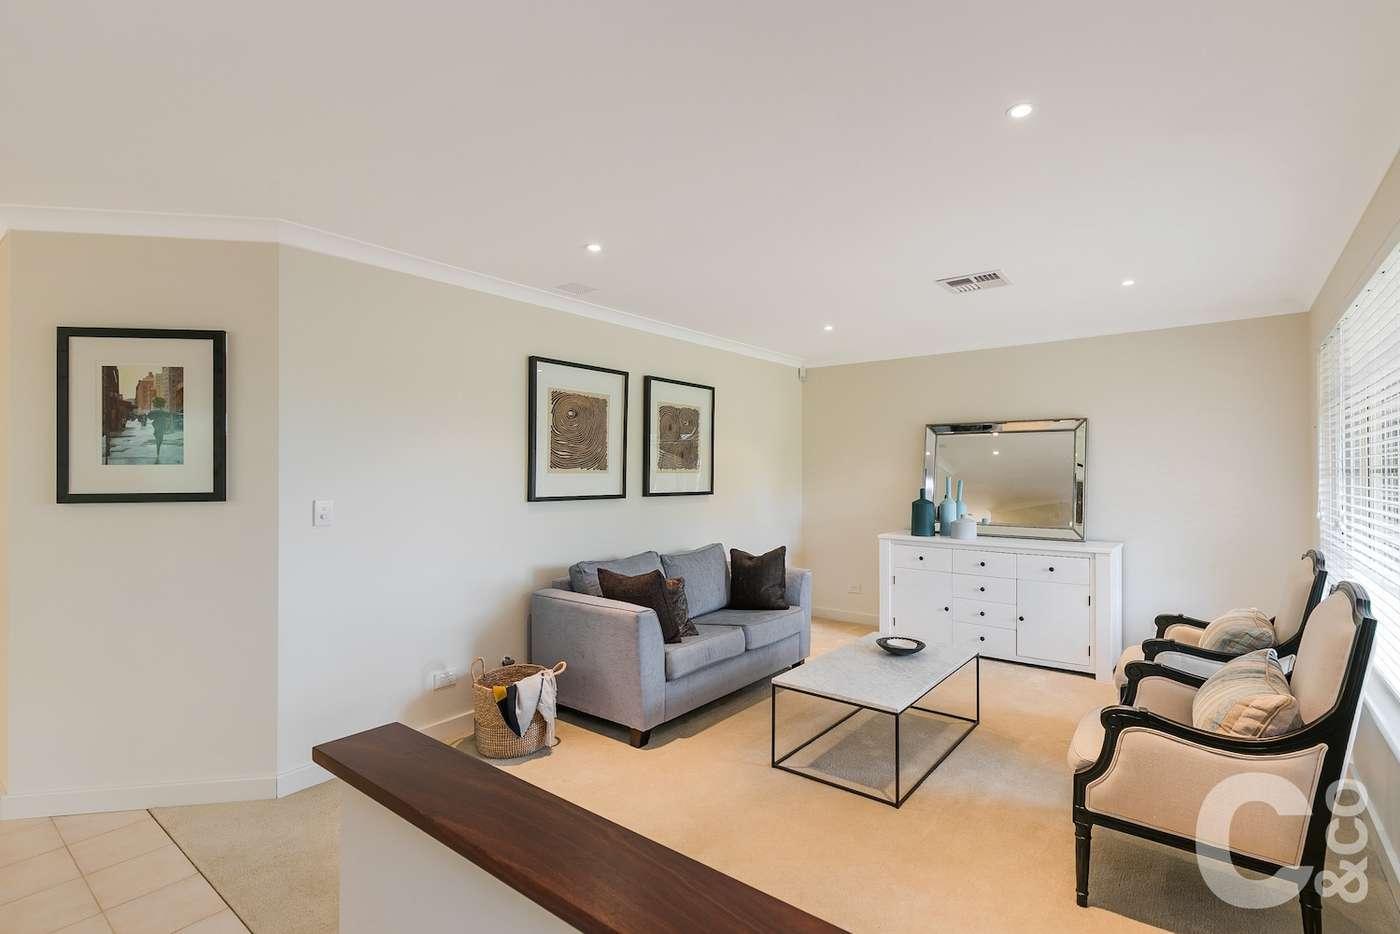 Fifth view of Homely house listing, 10 Silversmith Street, Wellard WA 6170